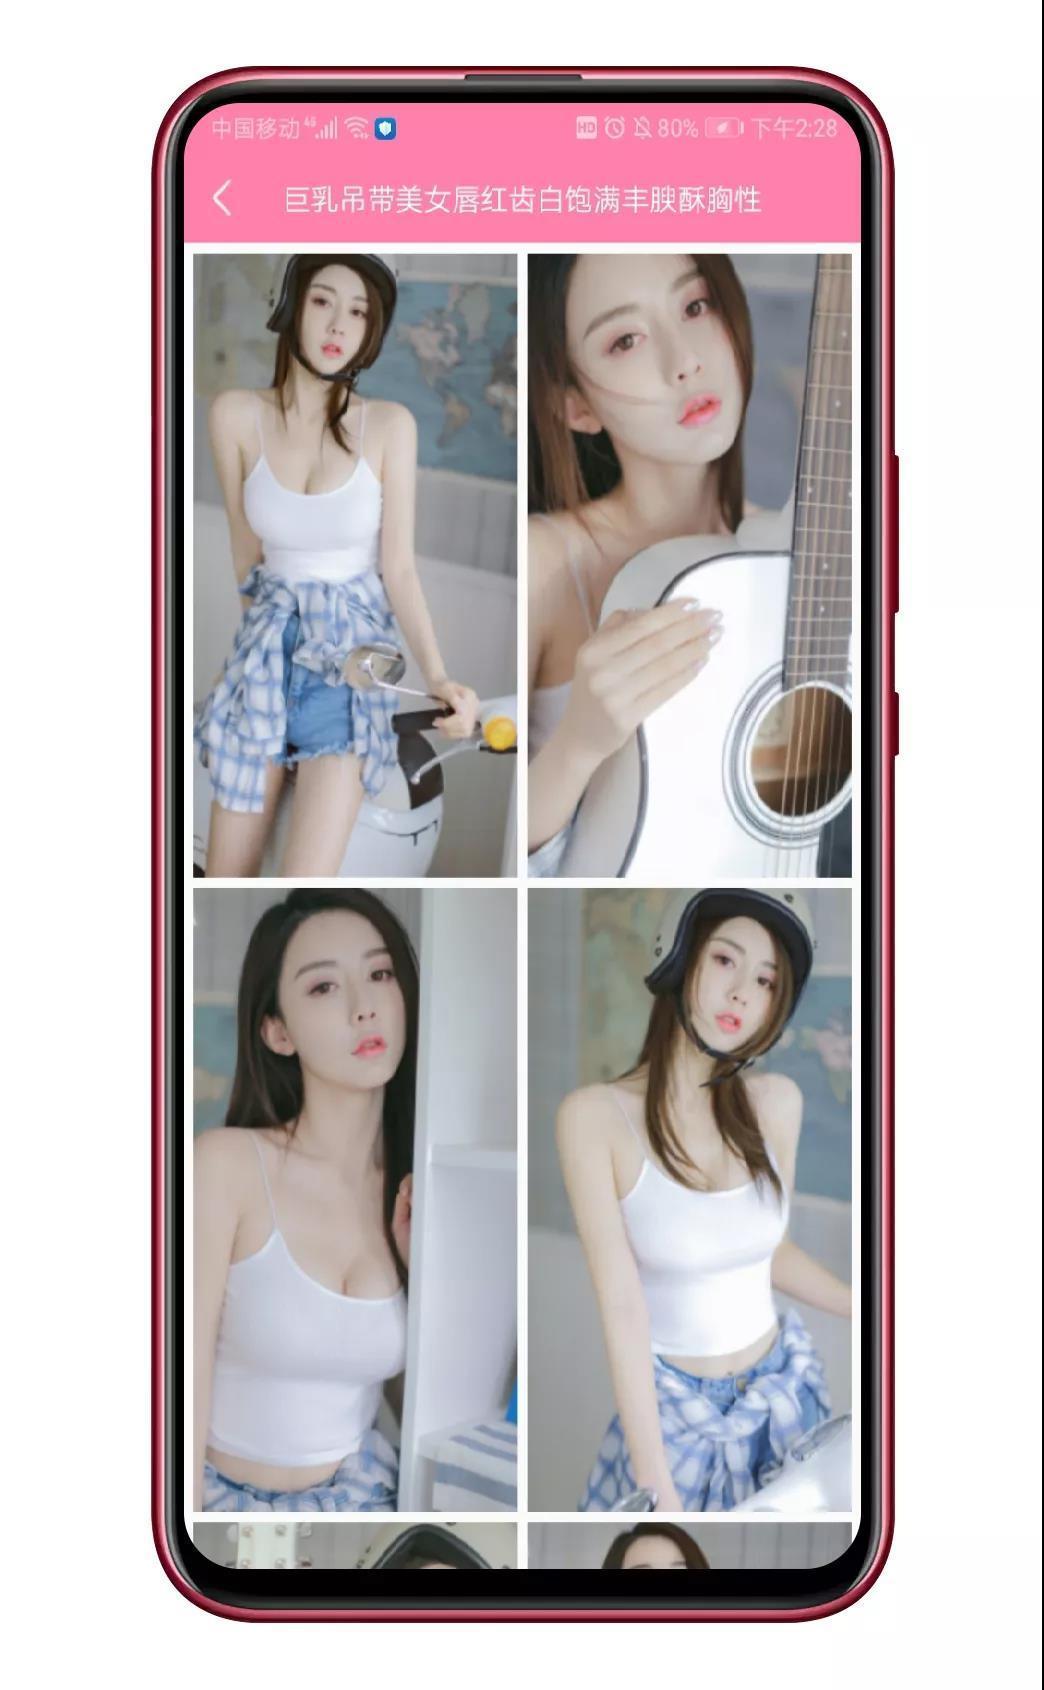 60e4230f5132923bf86301df 分享一款资源丰富的美图壁纸APP--清纯美女壁纸